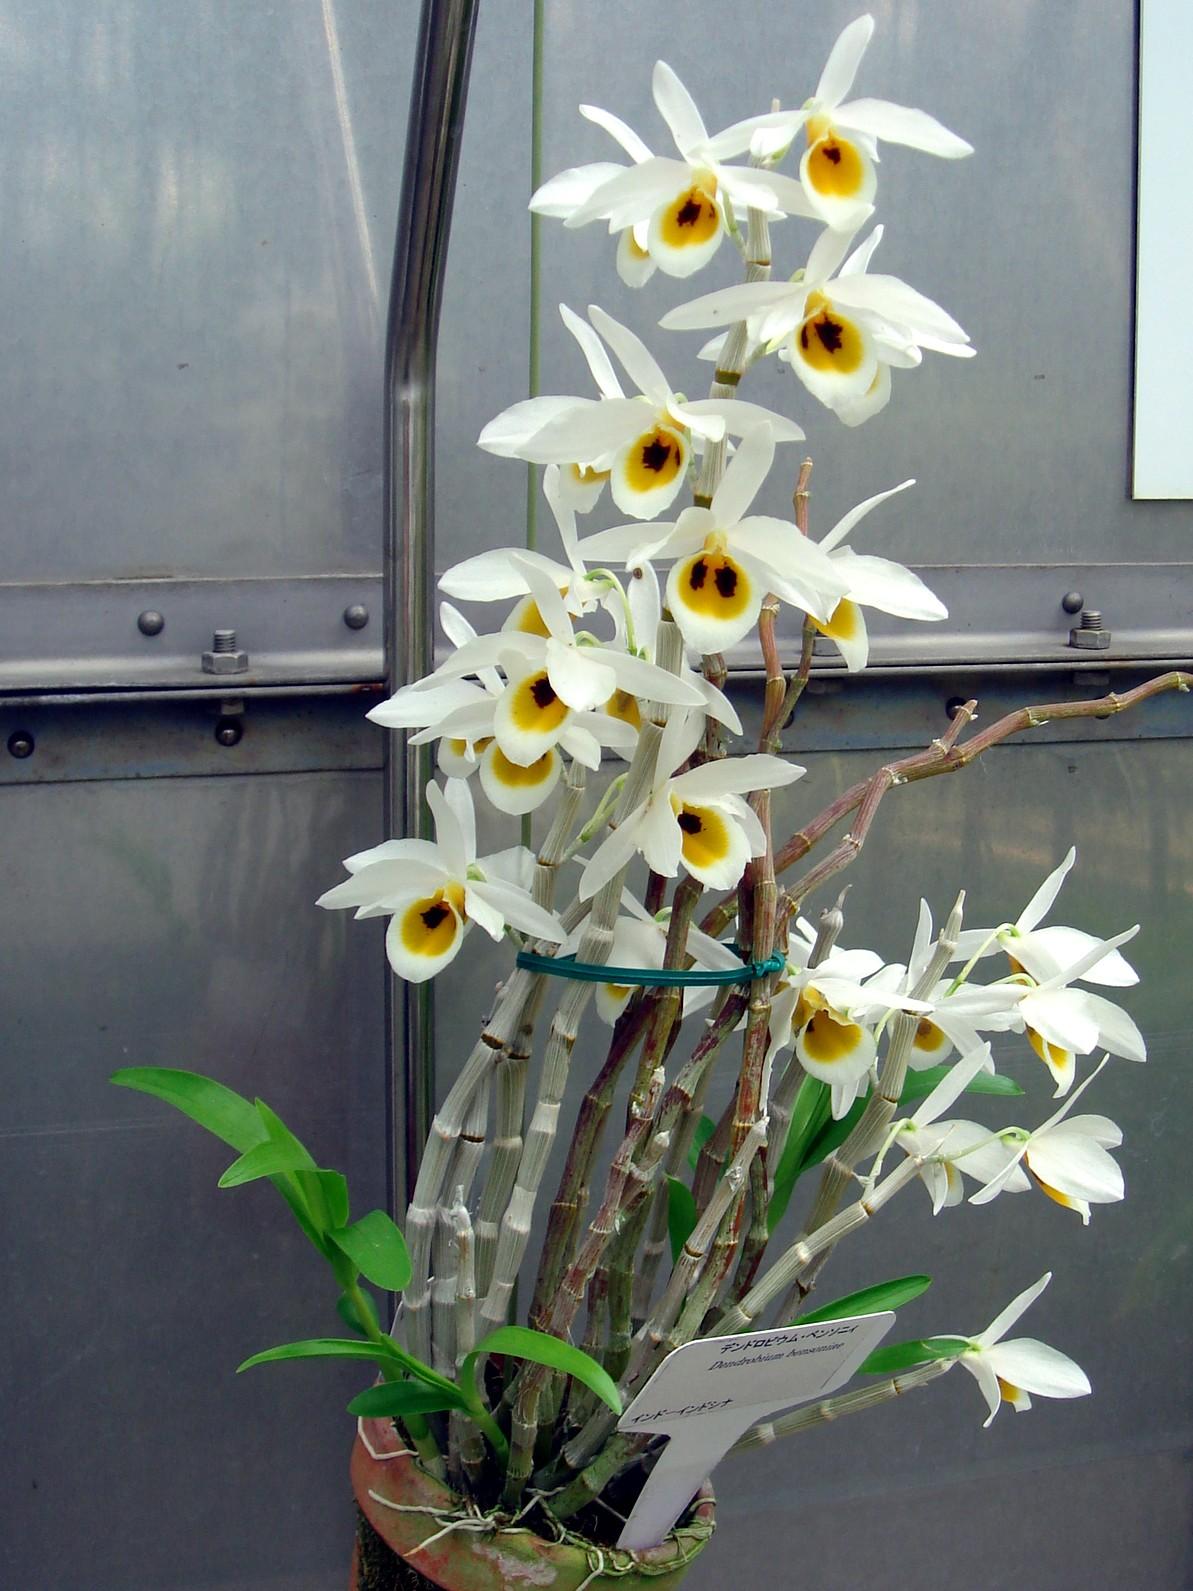 http://orchids.la.coocan.jp/Dendrobium/Dendrobium%20bensoniae/DSC01786.JPG